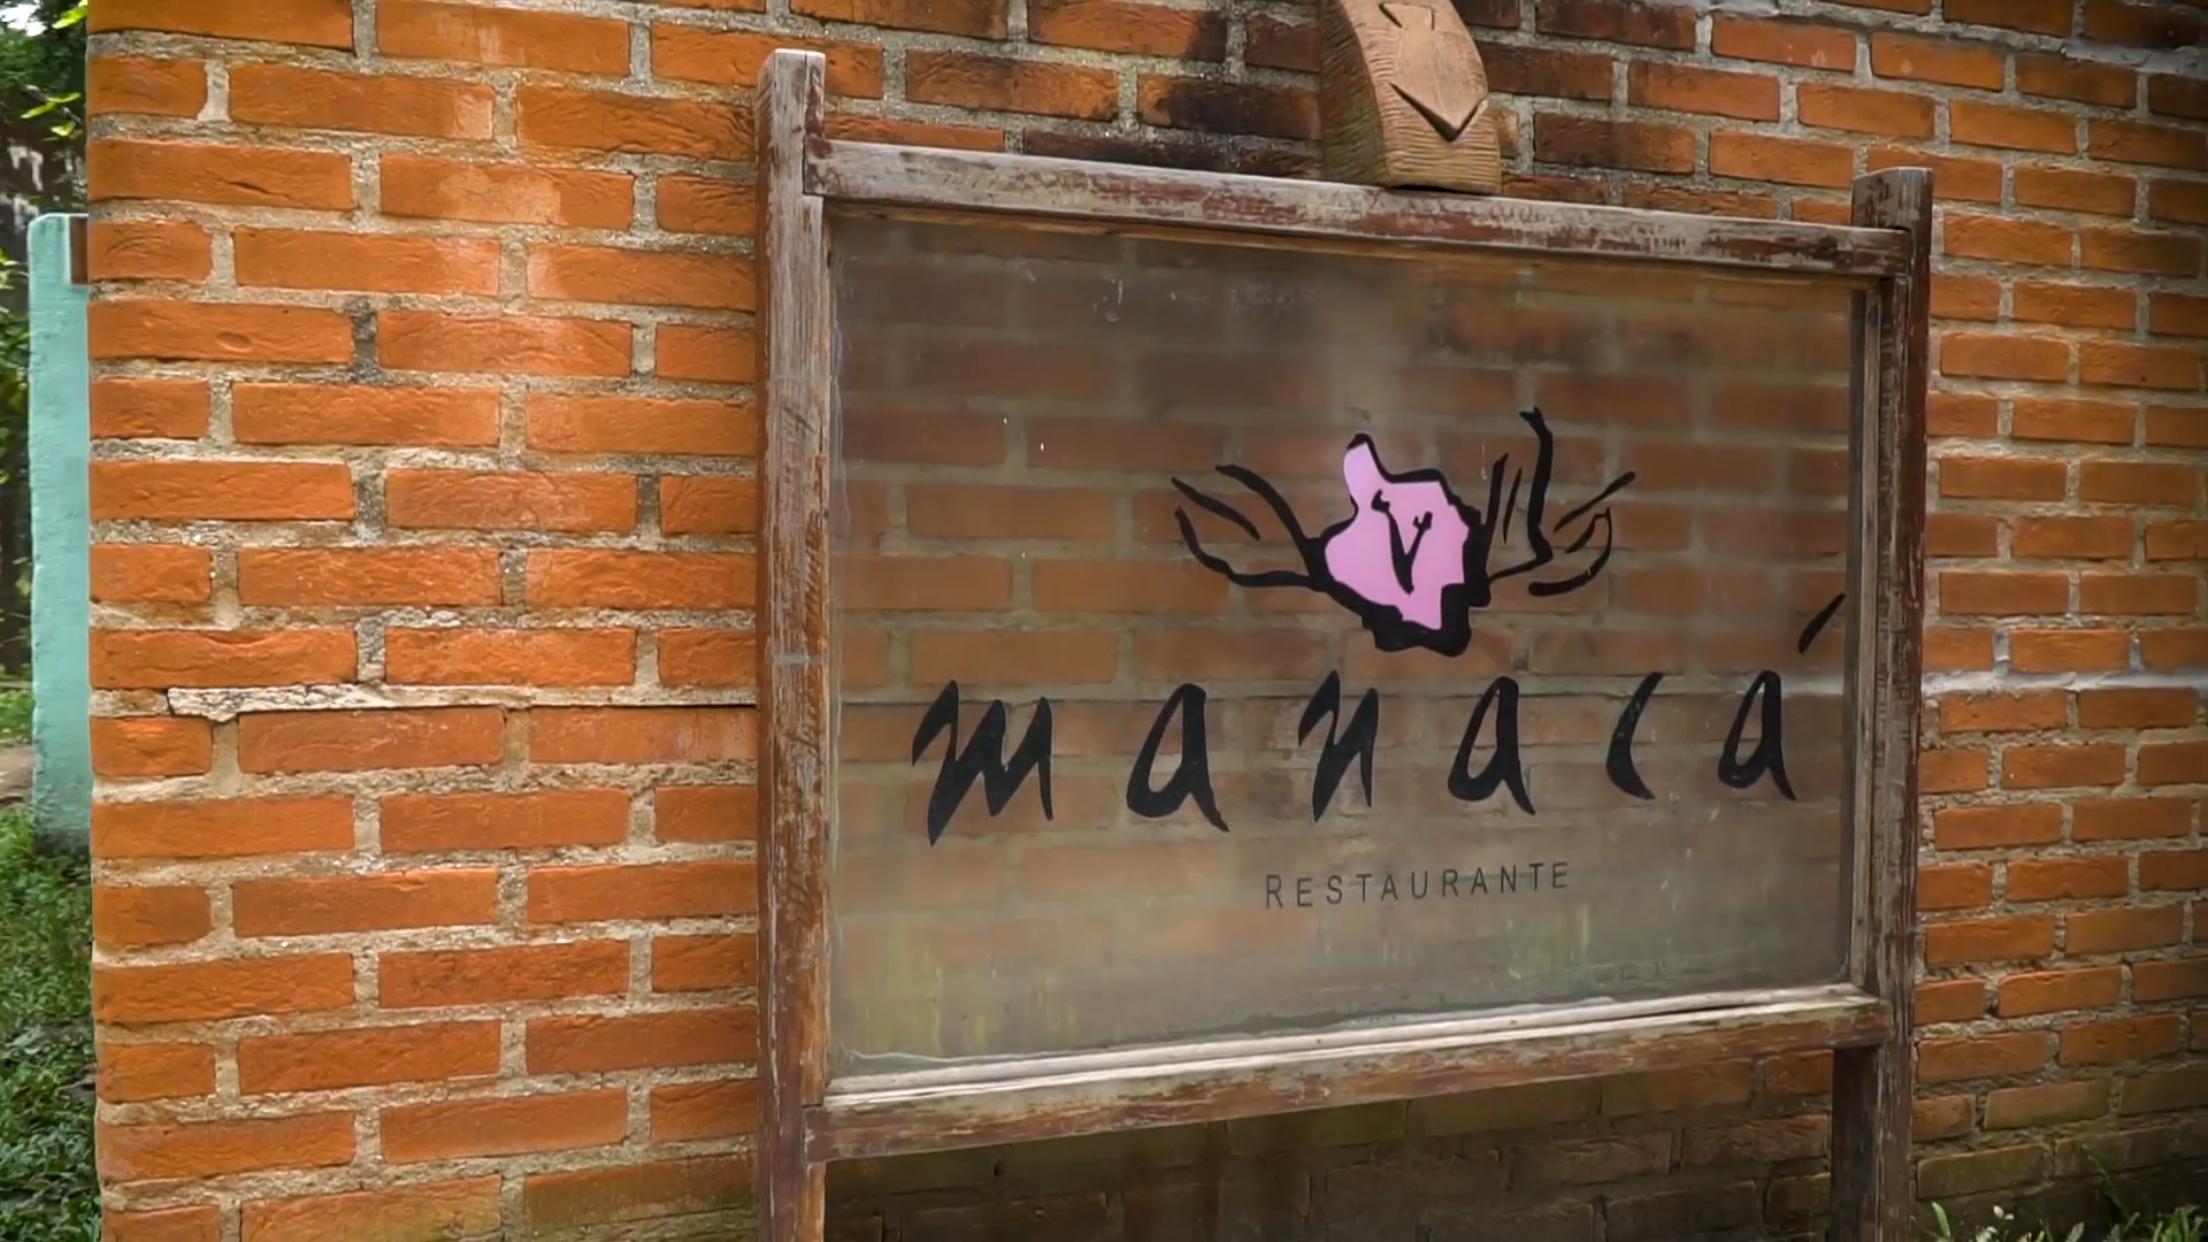 Restaurante Manacá